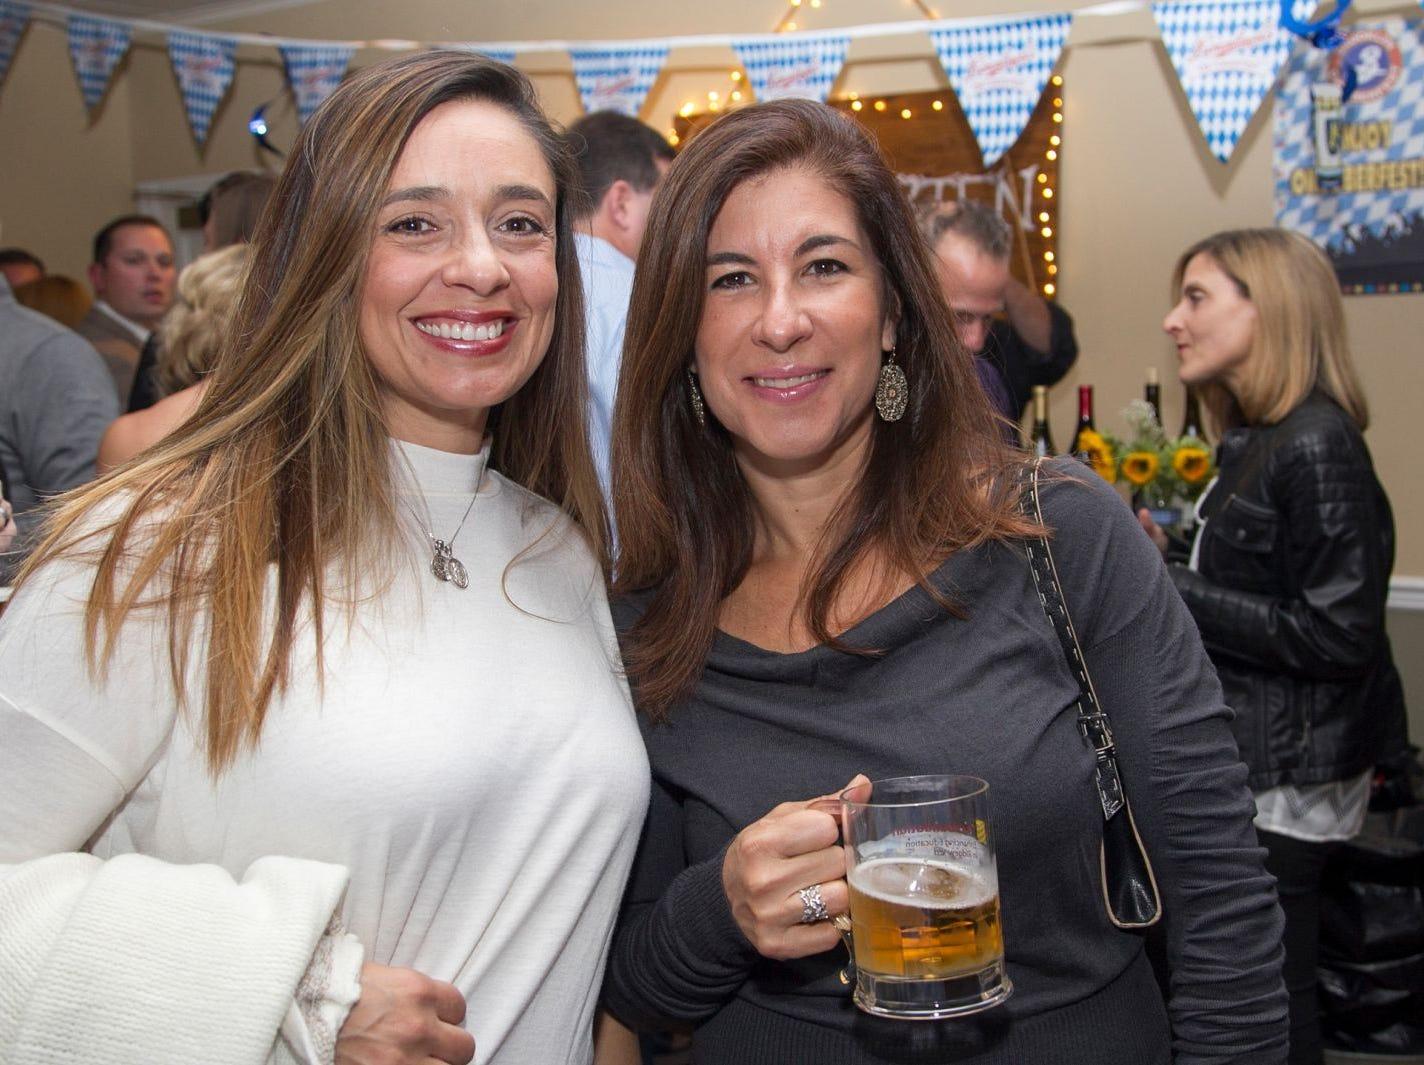 Lilly Melarti and Olga Jordan. Ridgewood Education Foundation's 2018 Oktoberfest at the Hermitage. 09/29/2018